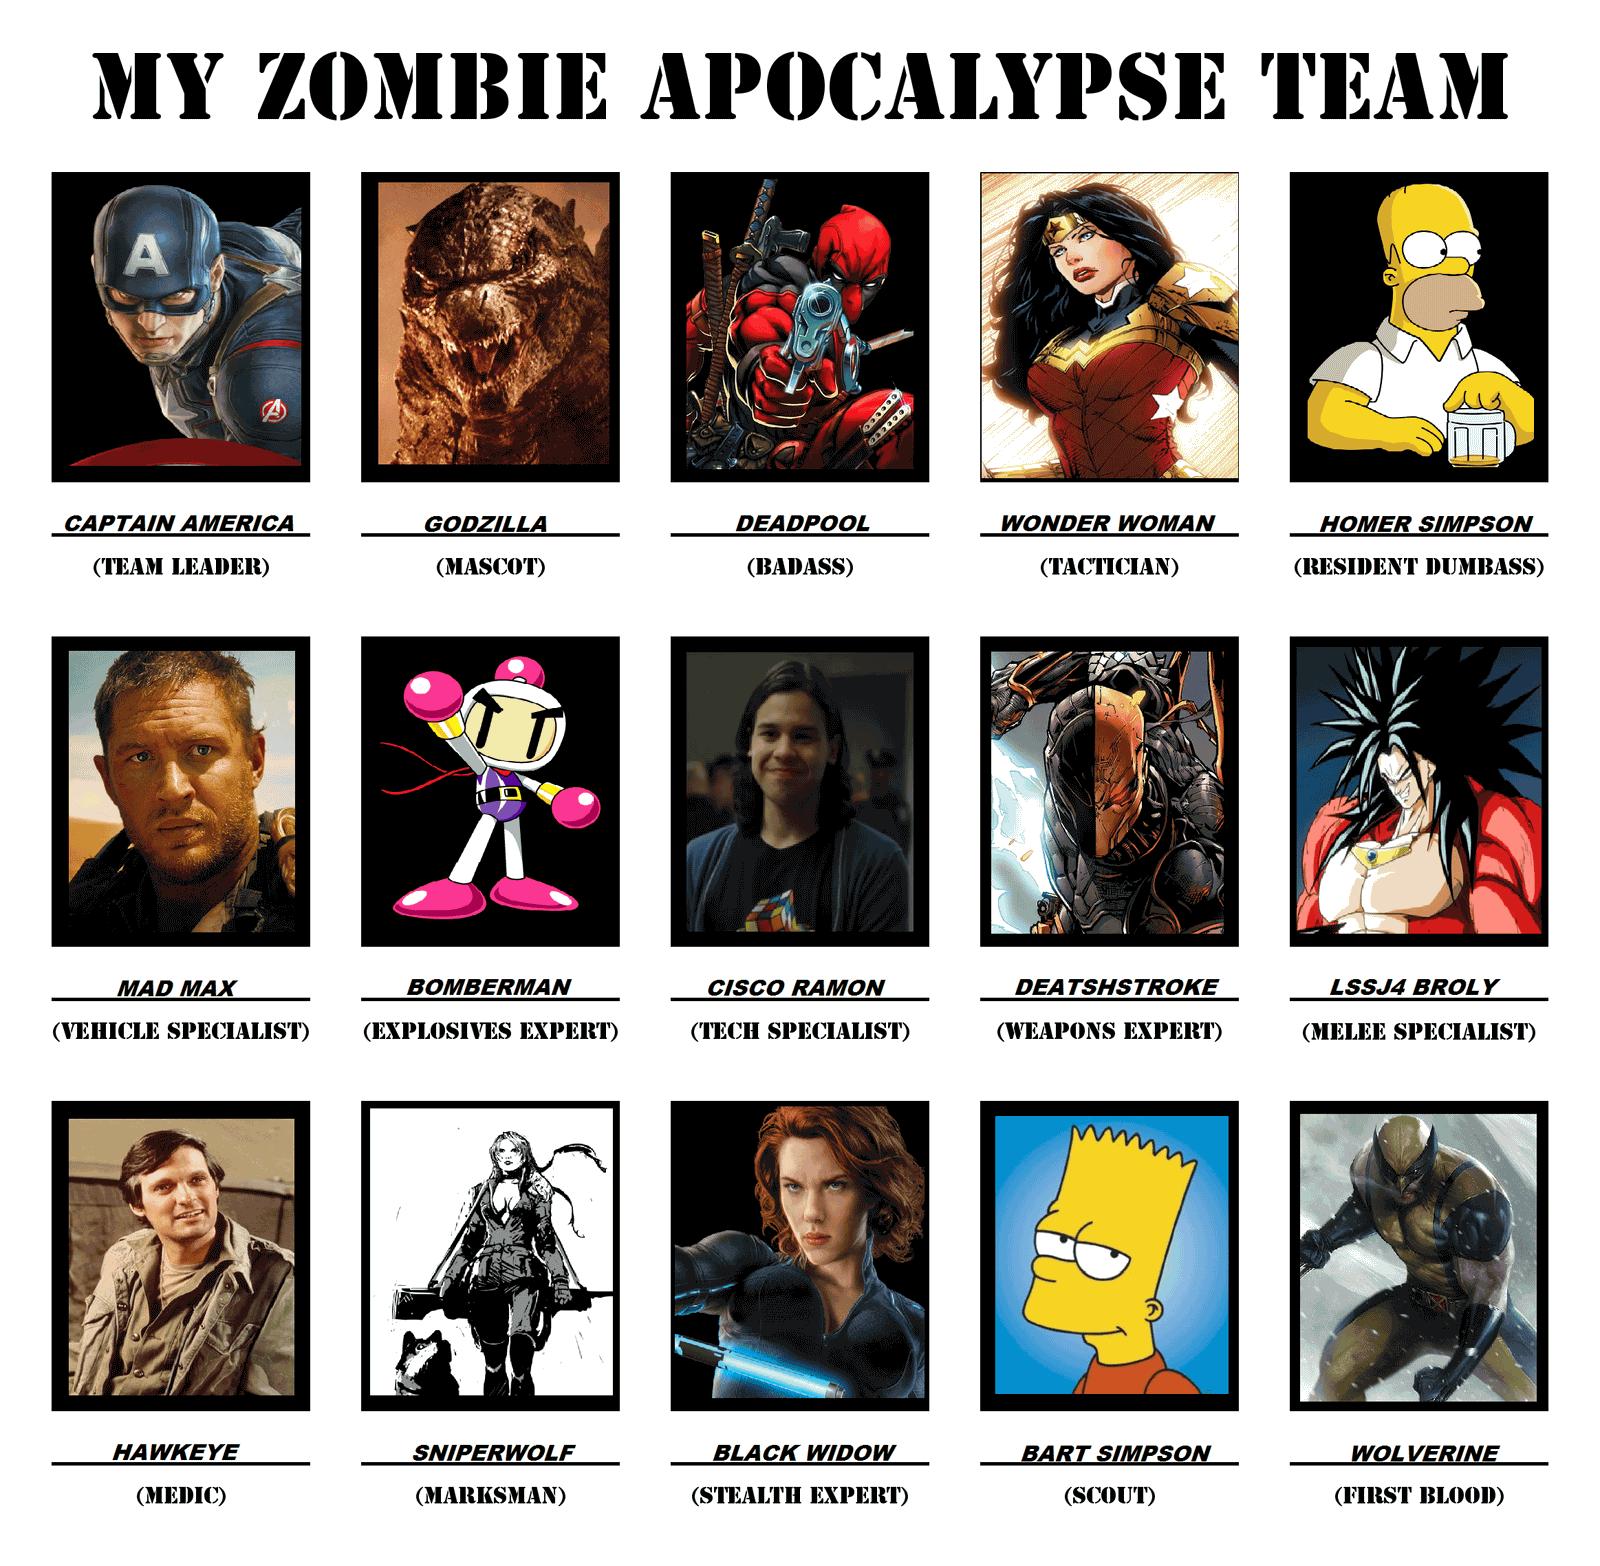 Zombie Apocalypse Team Meme Funny Joke 10